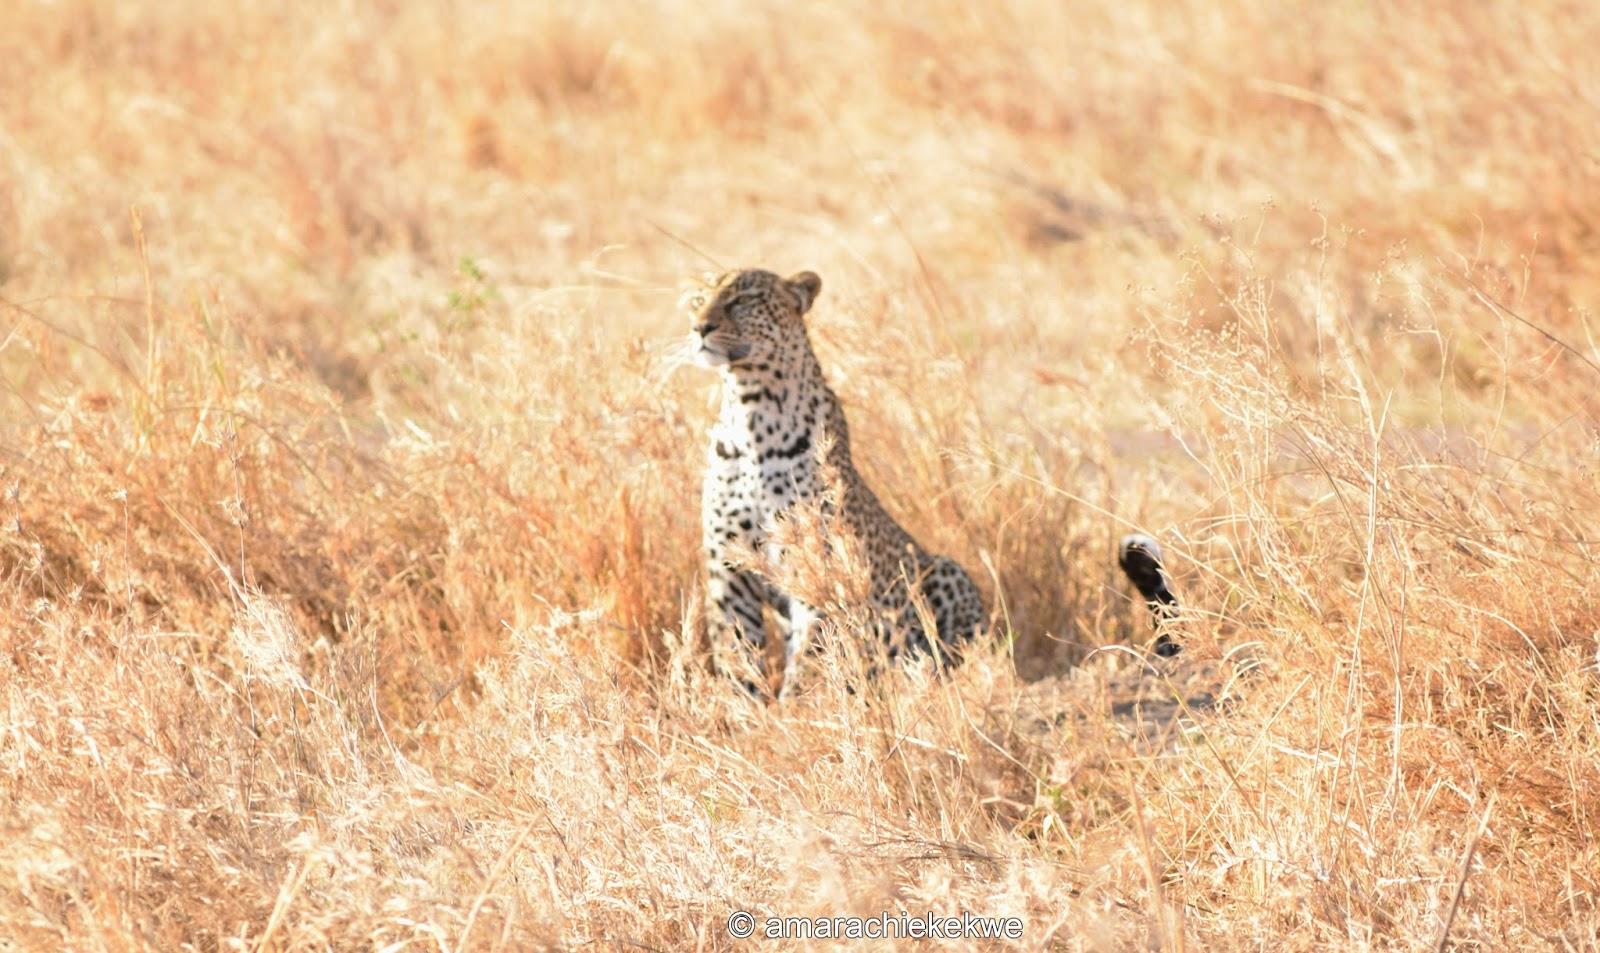 https://i2.wp.com/3.bp.blogspot.com/-wfwqKEgYoPI/WGk4Vq3ghBI/AAAAAAAAXoQ/09rJ-QMU3iAXE6z7uUCMEtyoIHbNdaIDwCLcB/s1600/leopard.jpg?resize=930%2C554&ssl=1